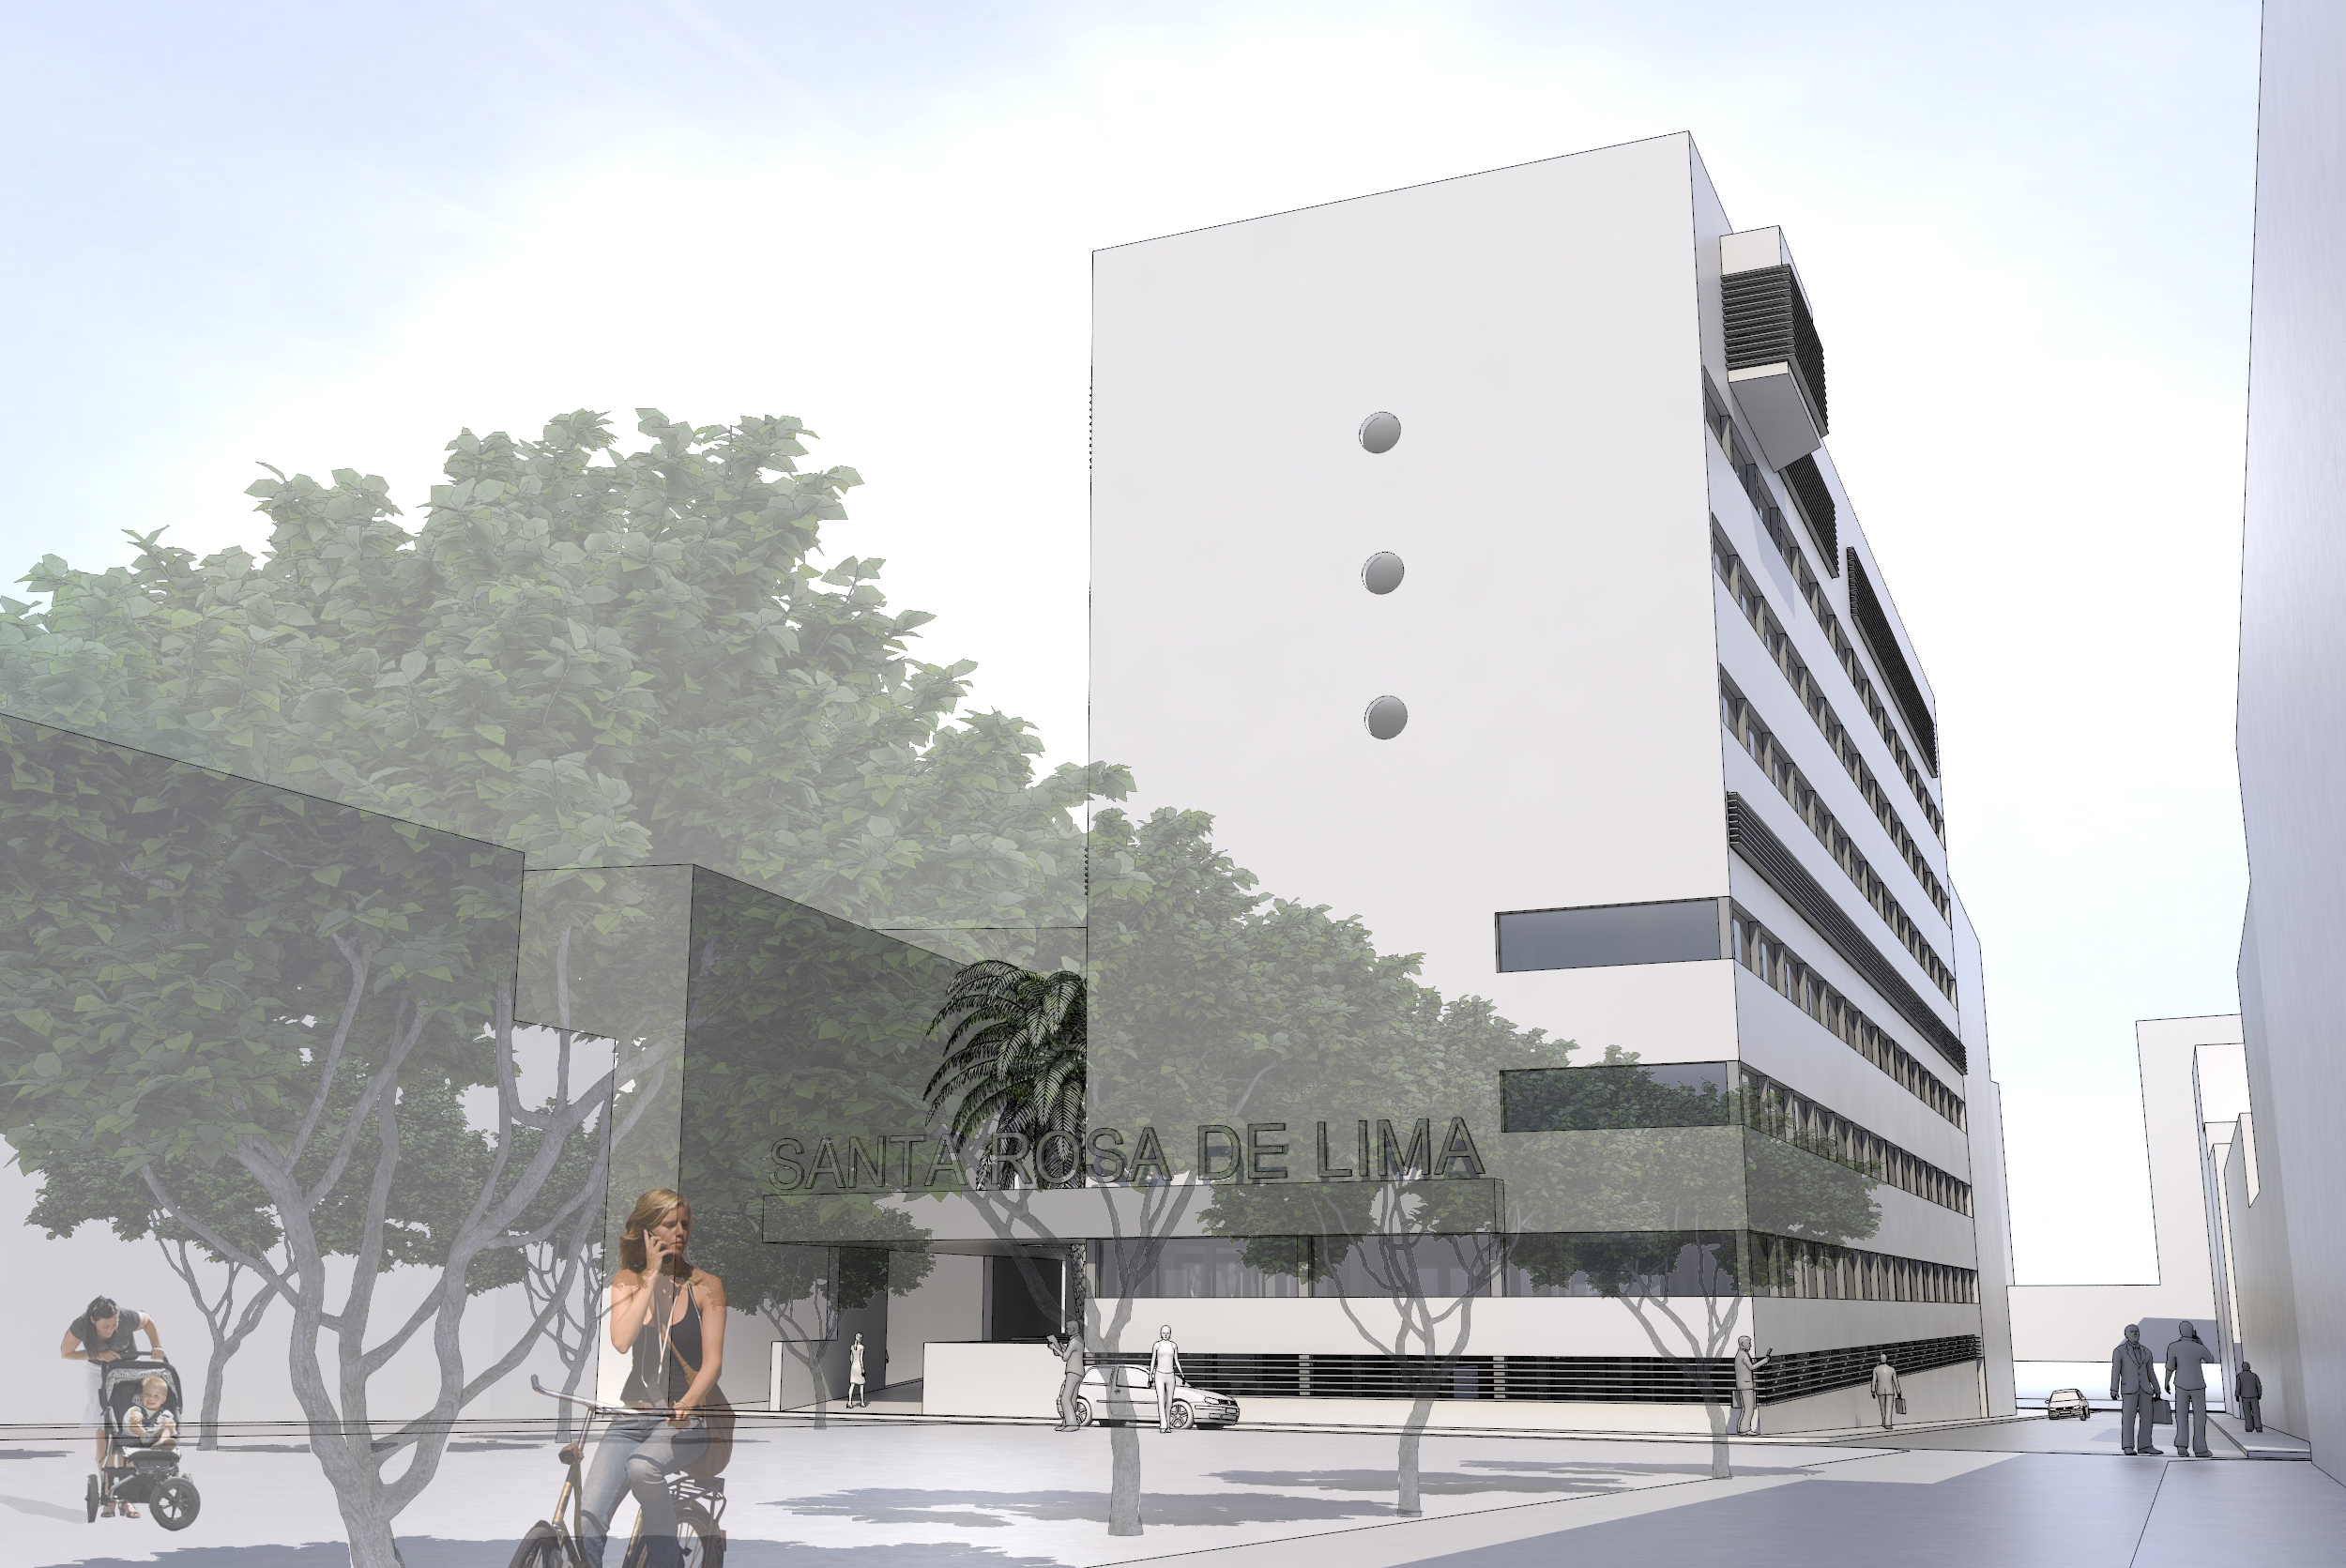 Relatio. HOSPITAL SANTA ROSA DE LIMA EN LORCA (MU)